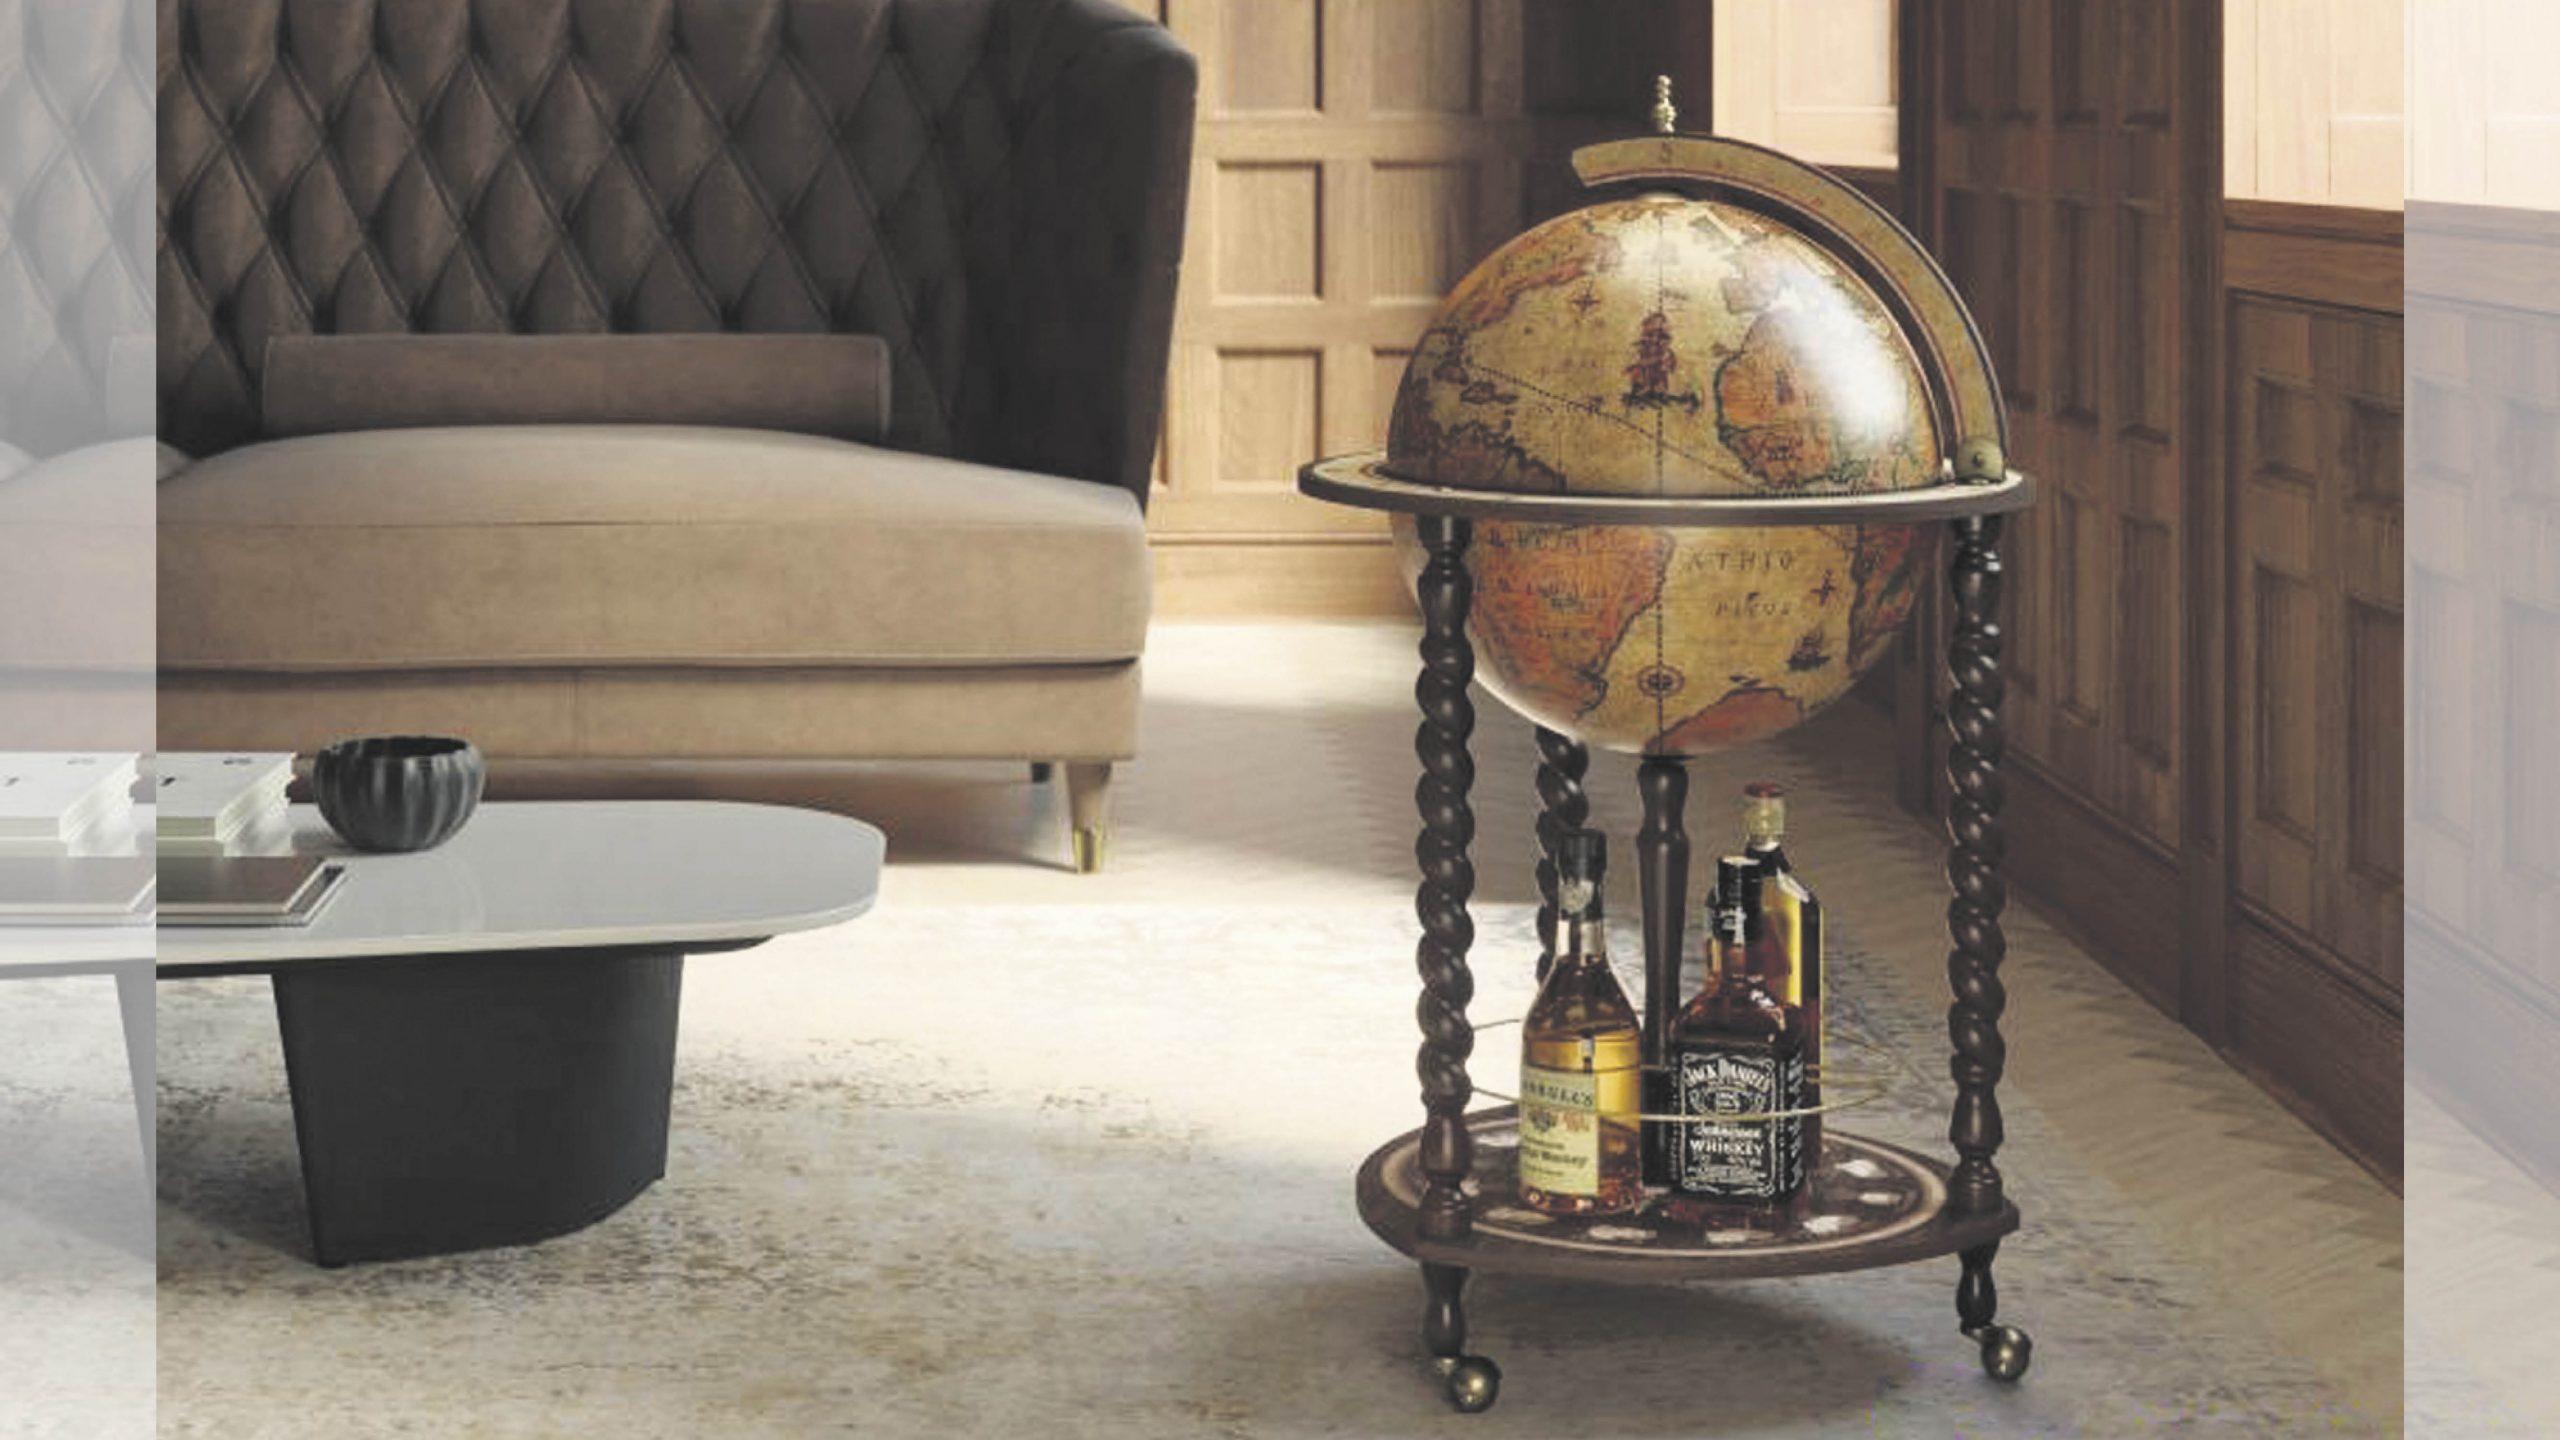 Win a handcrafted, Italian-made Globe Bar Worth £275!